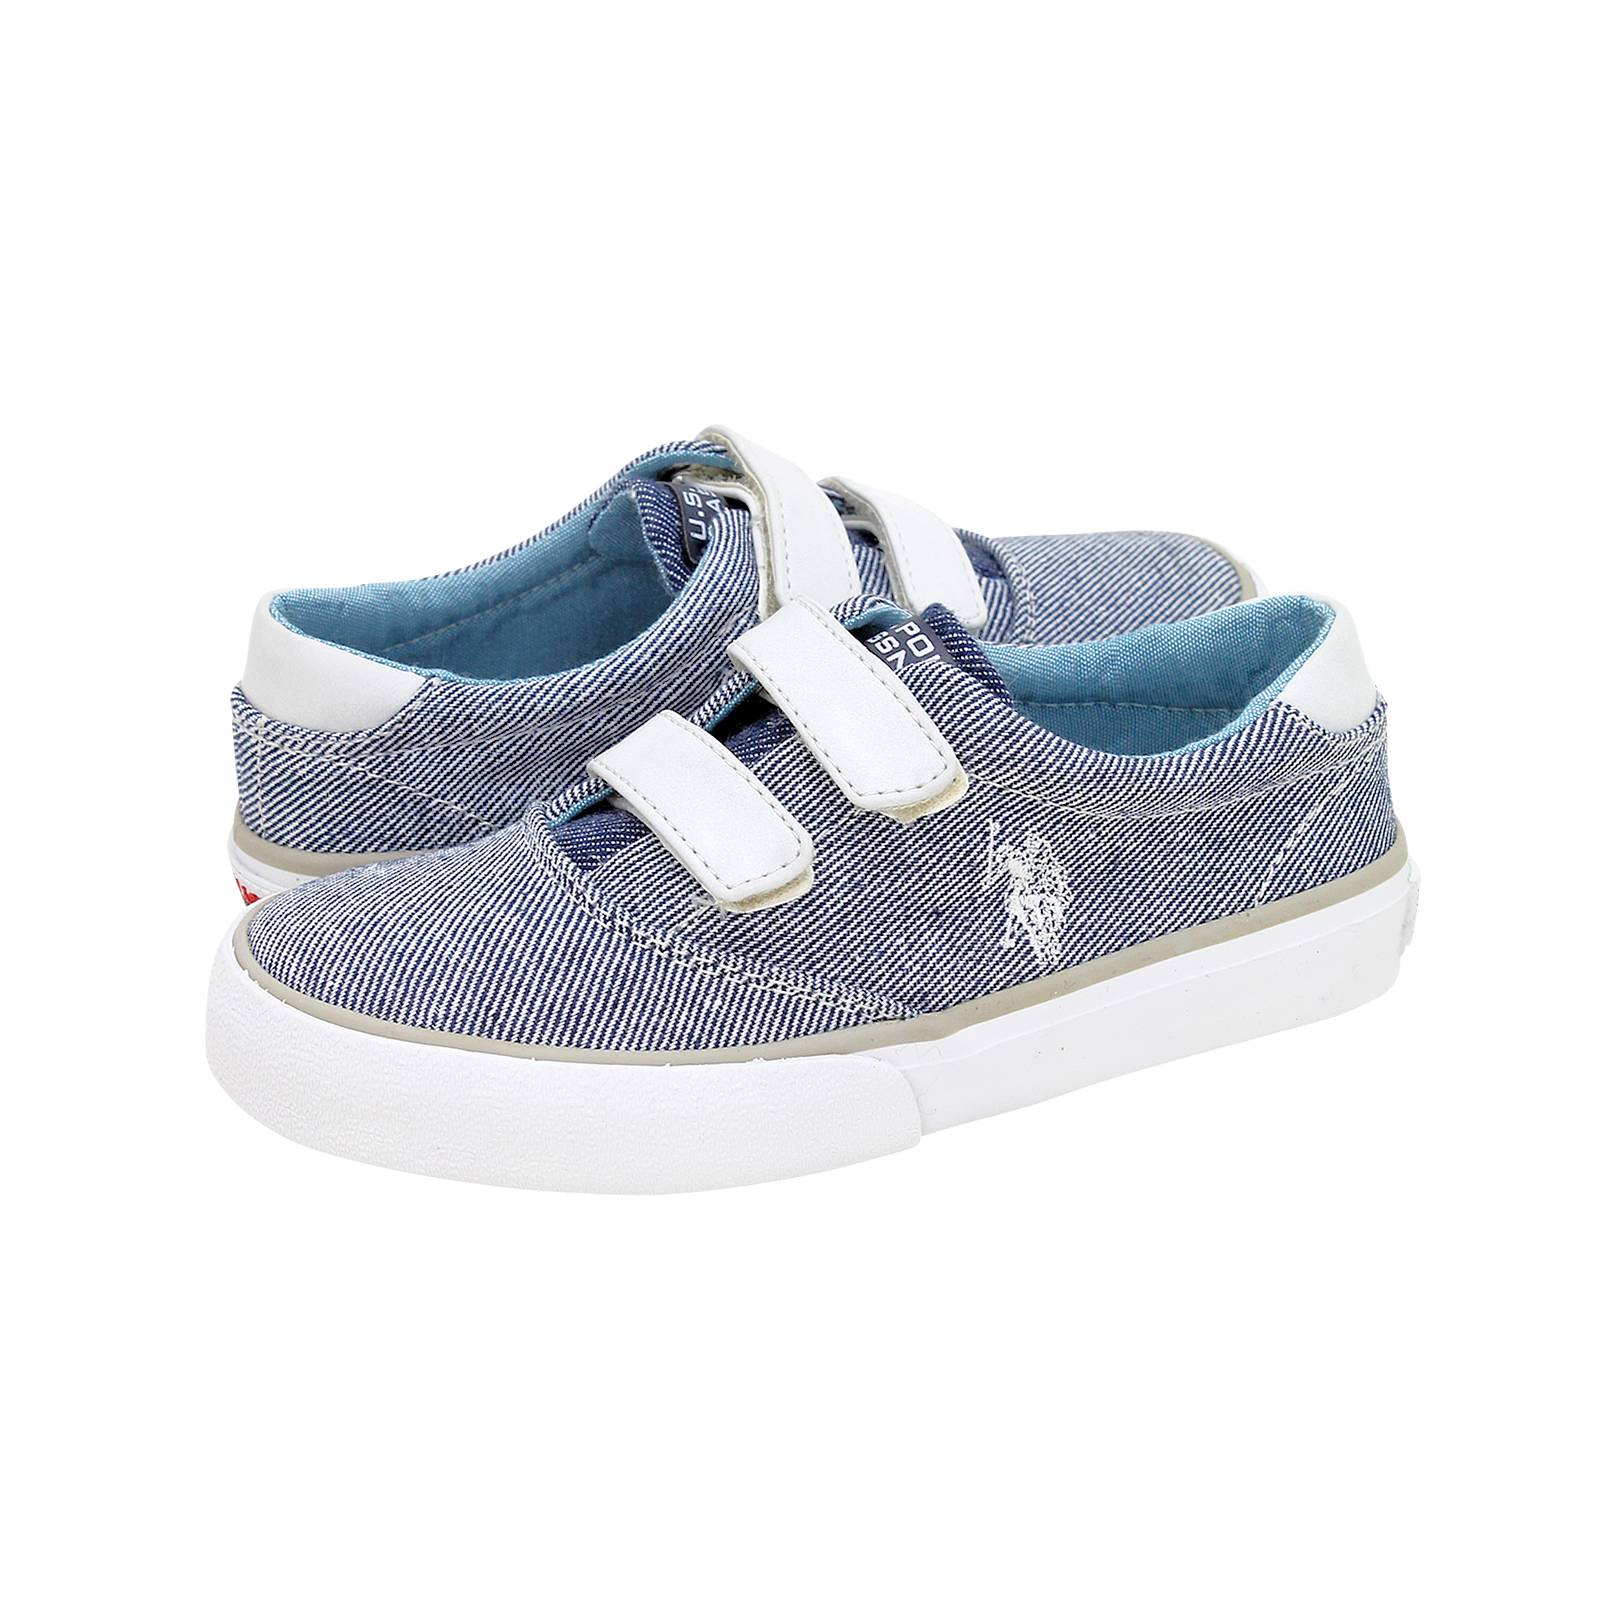 U.S. Polo ASSN Casual kids' shoes